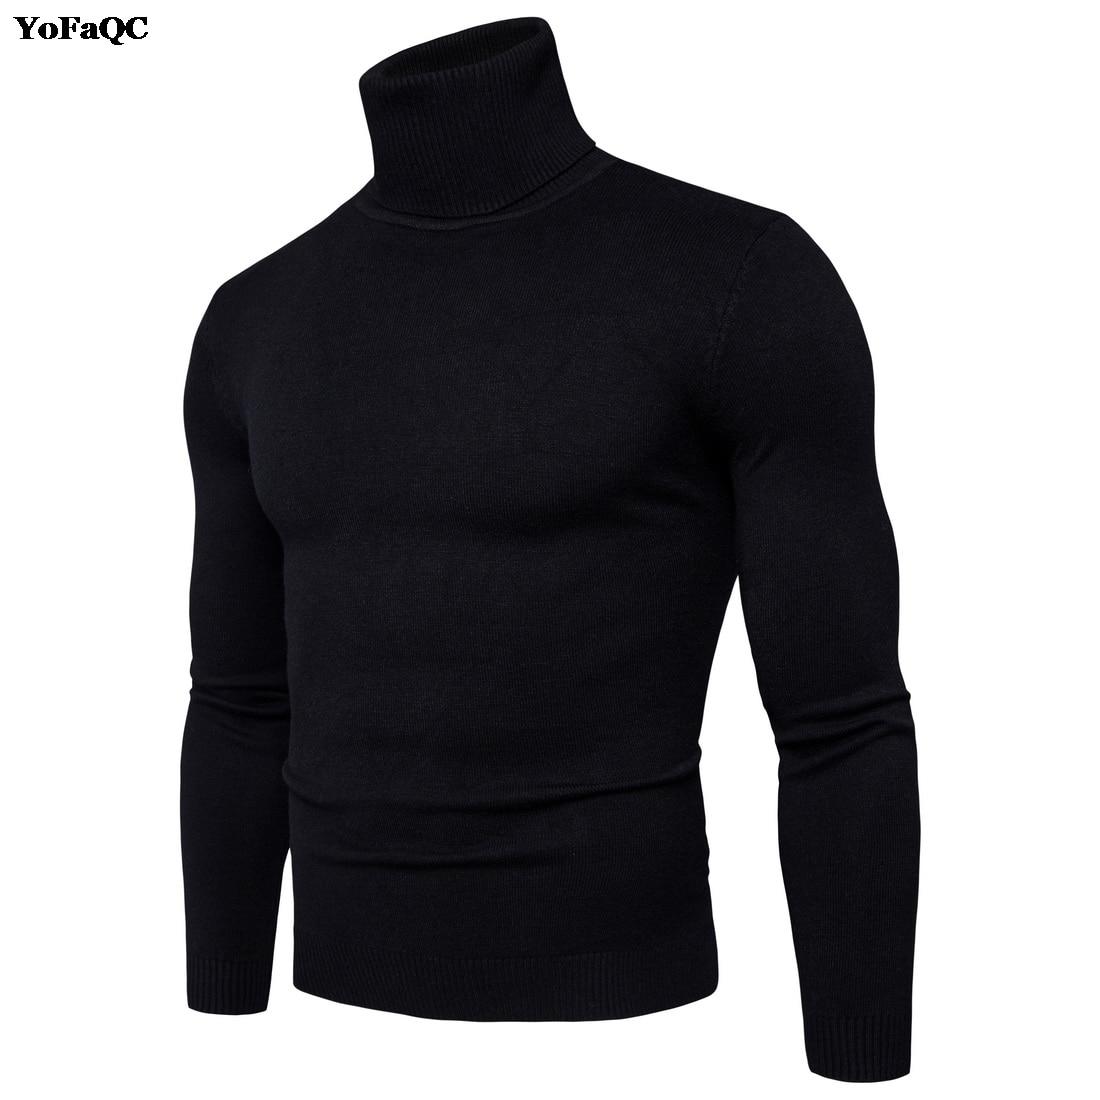 Turtleneck Sweater Mens Clothing